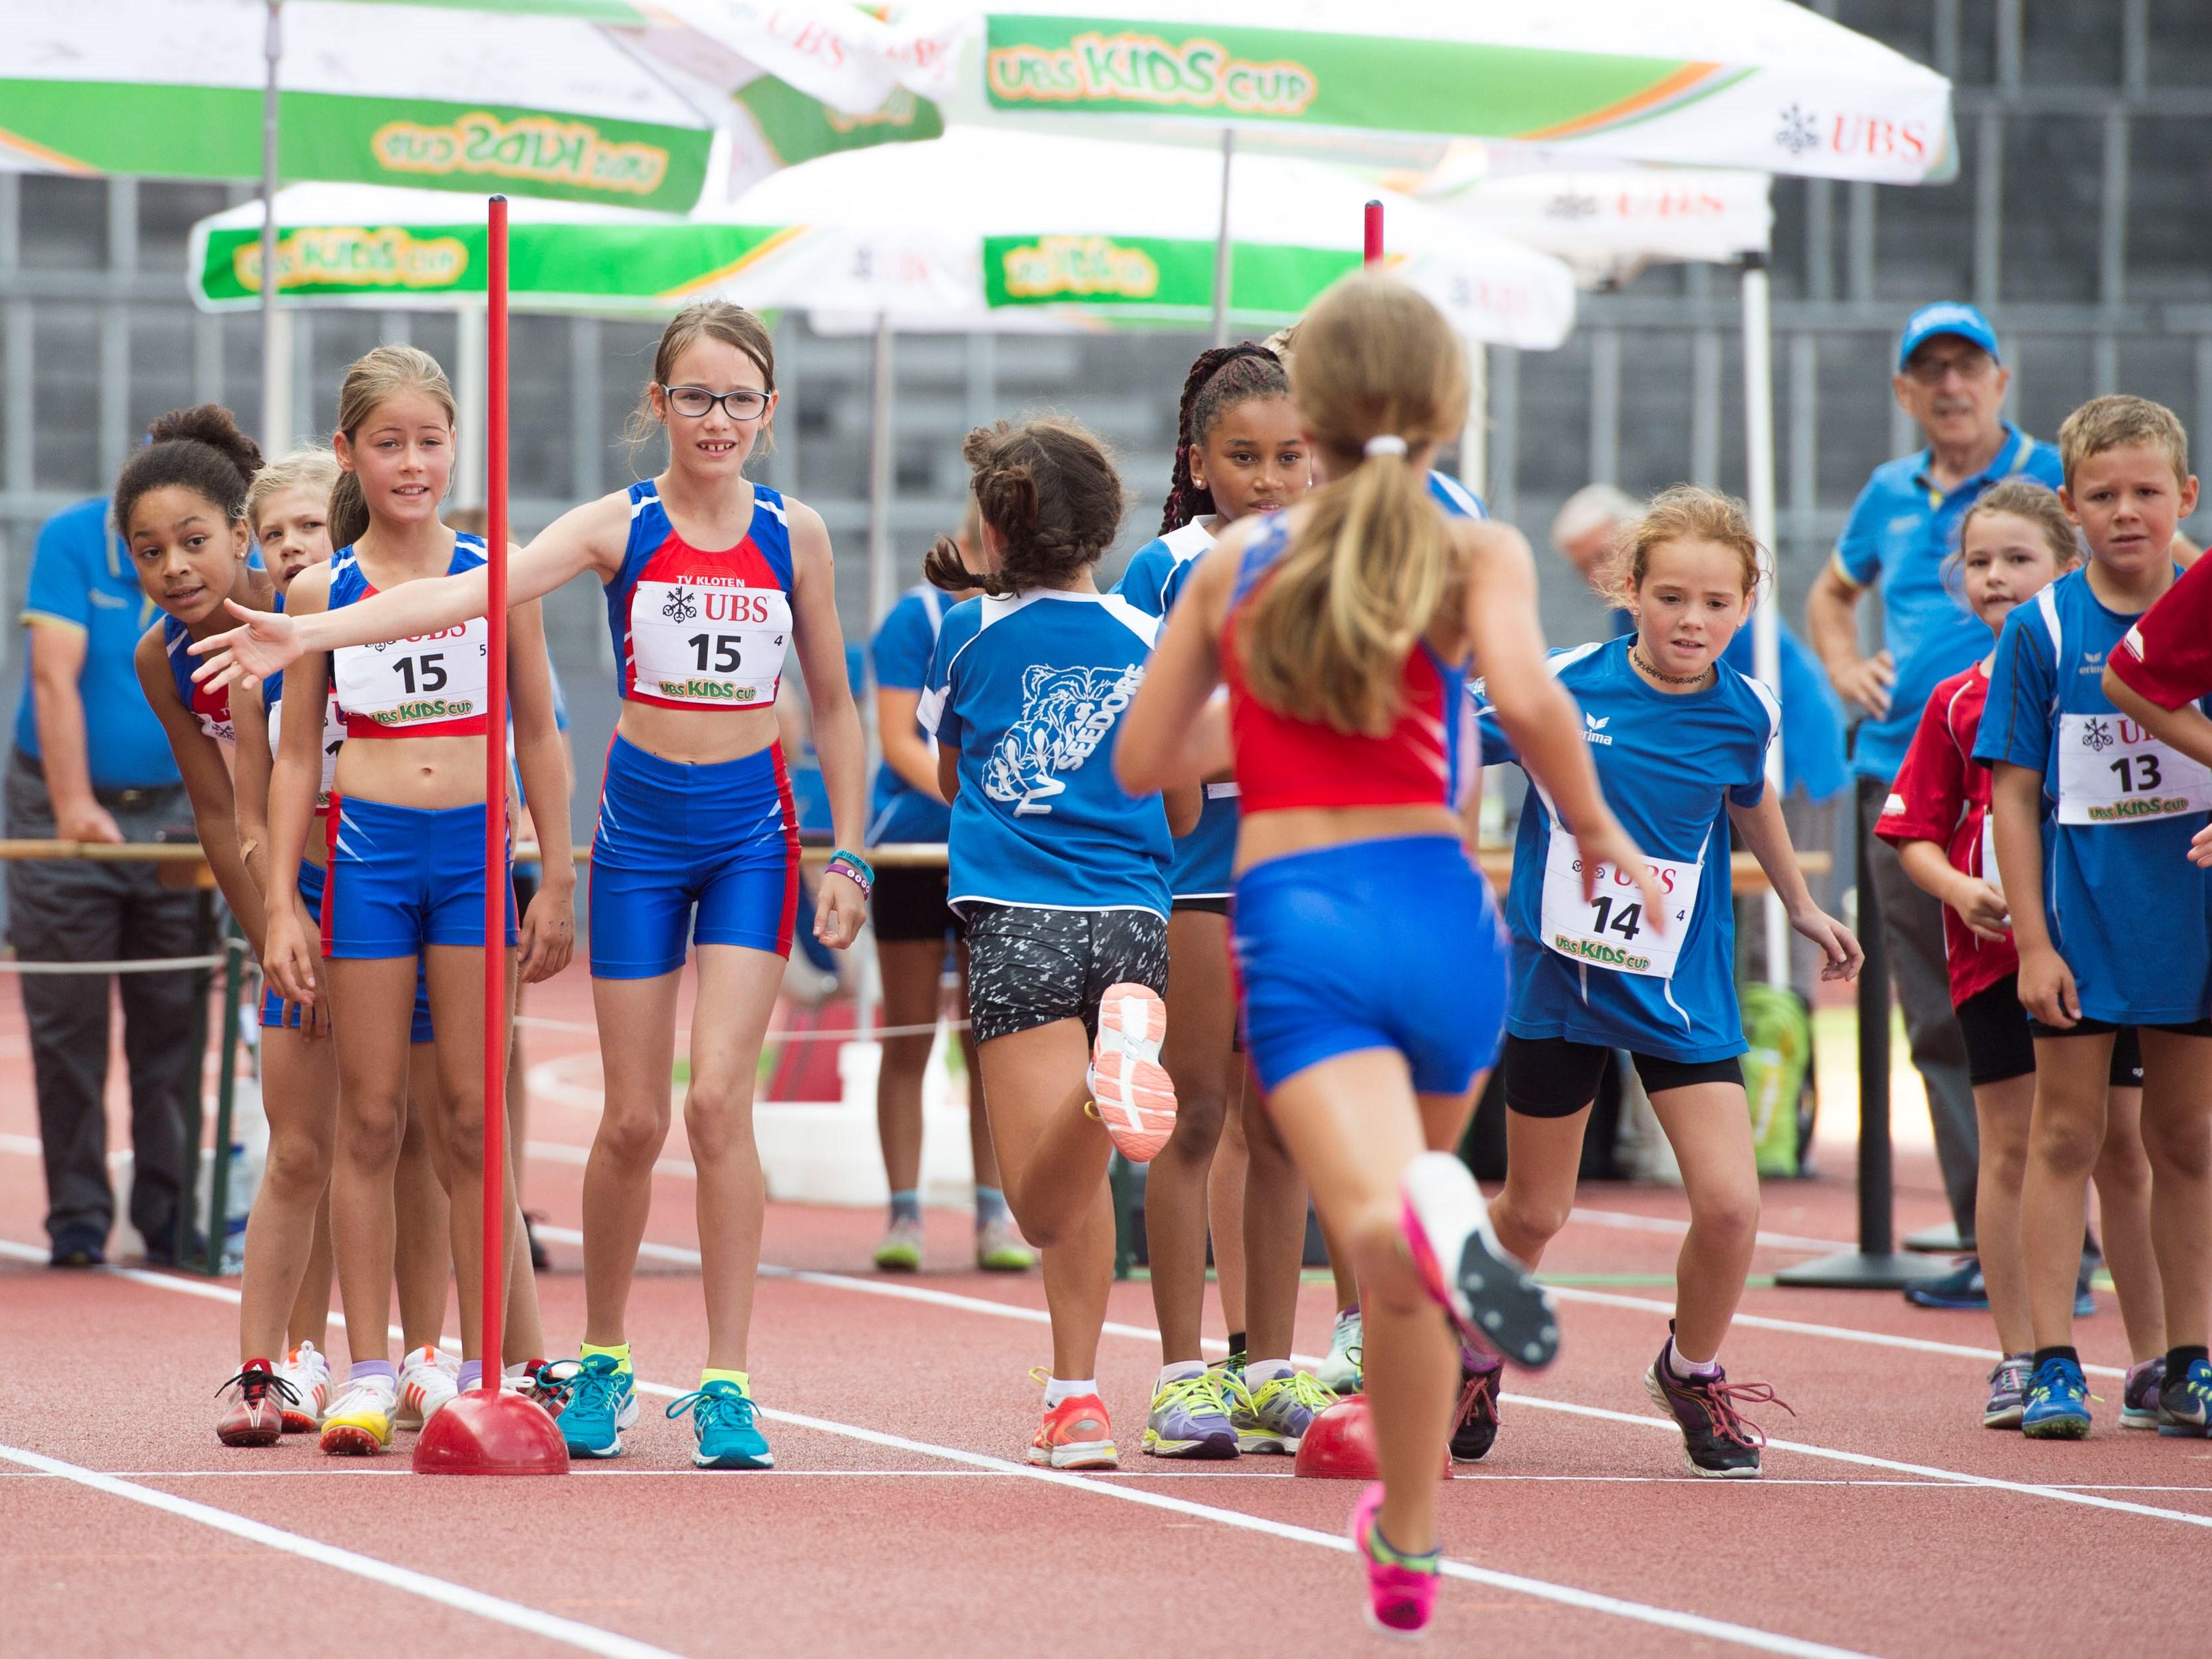 (Photo: UBS Kids Cup)